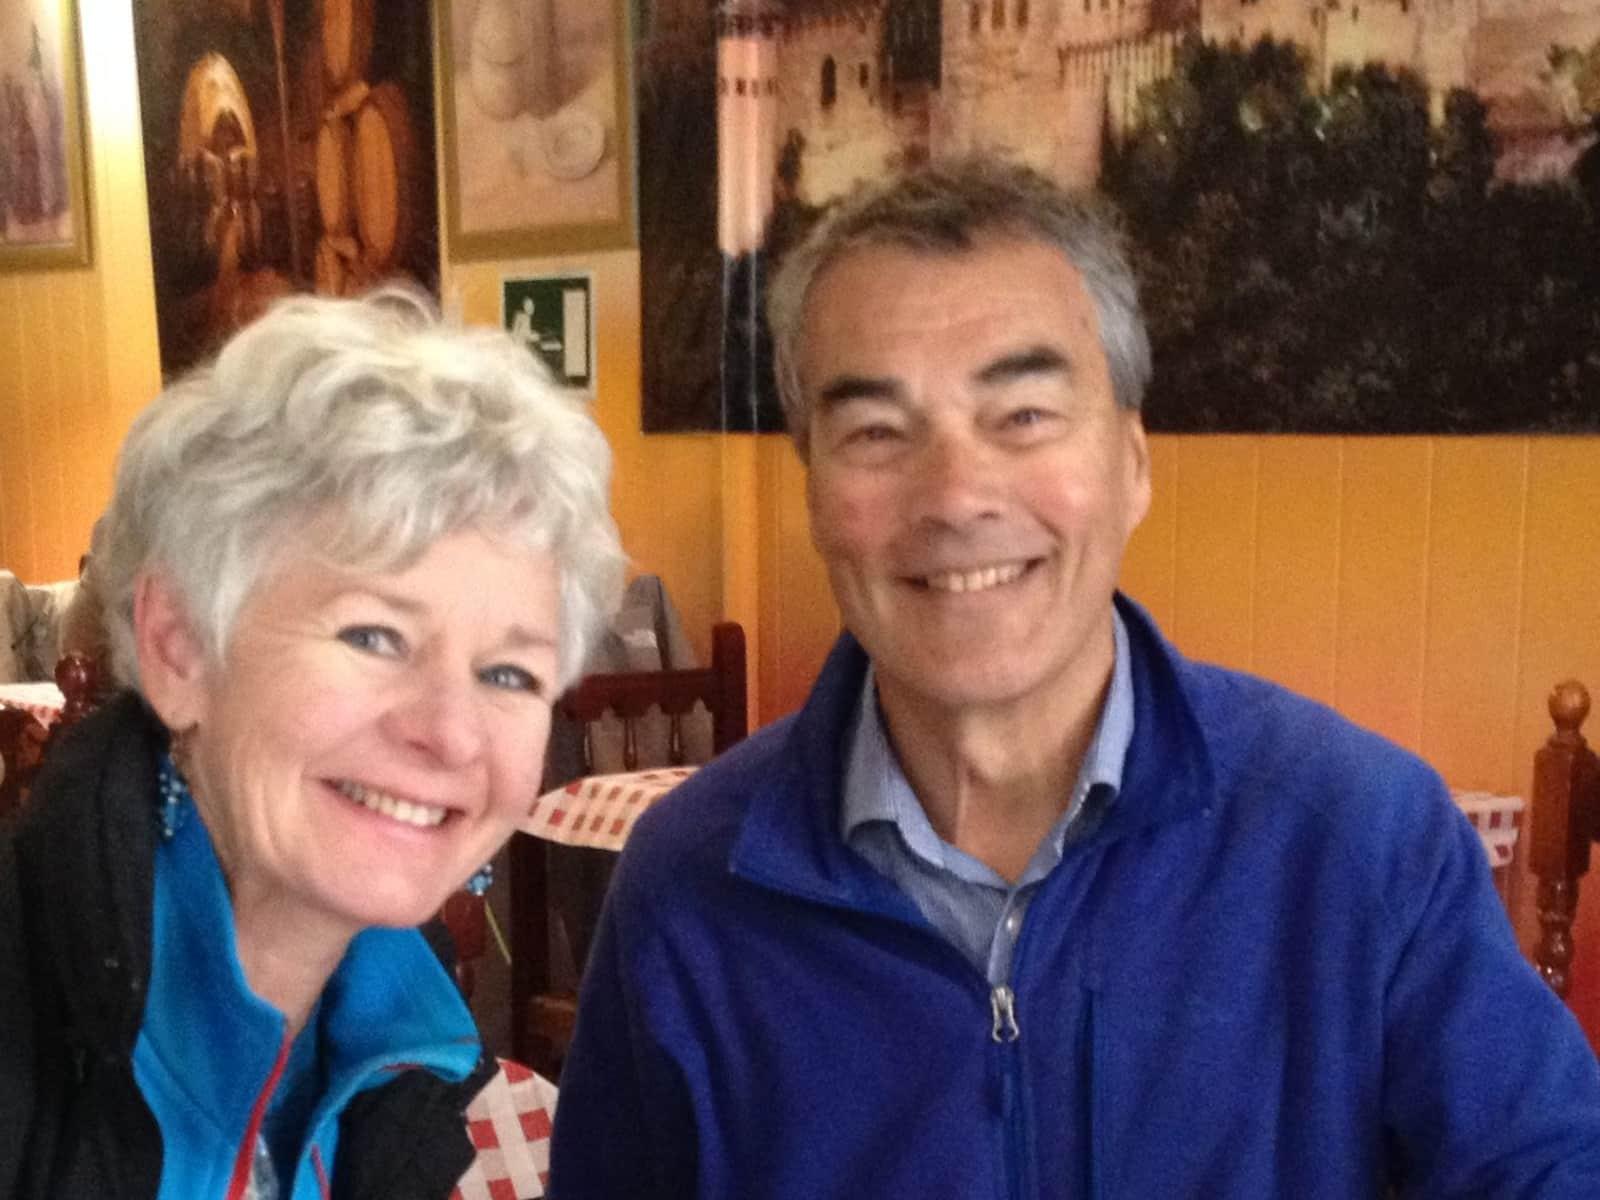 Geoffrey & merilyn & Merilyn from Hobart, Tasmania, Australia